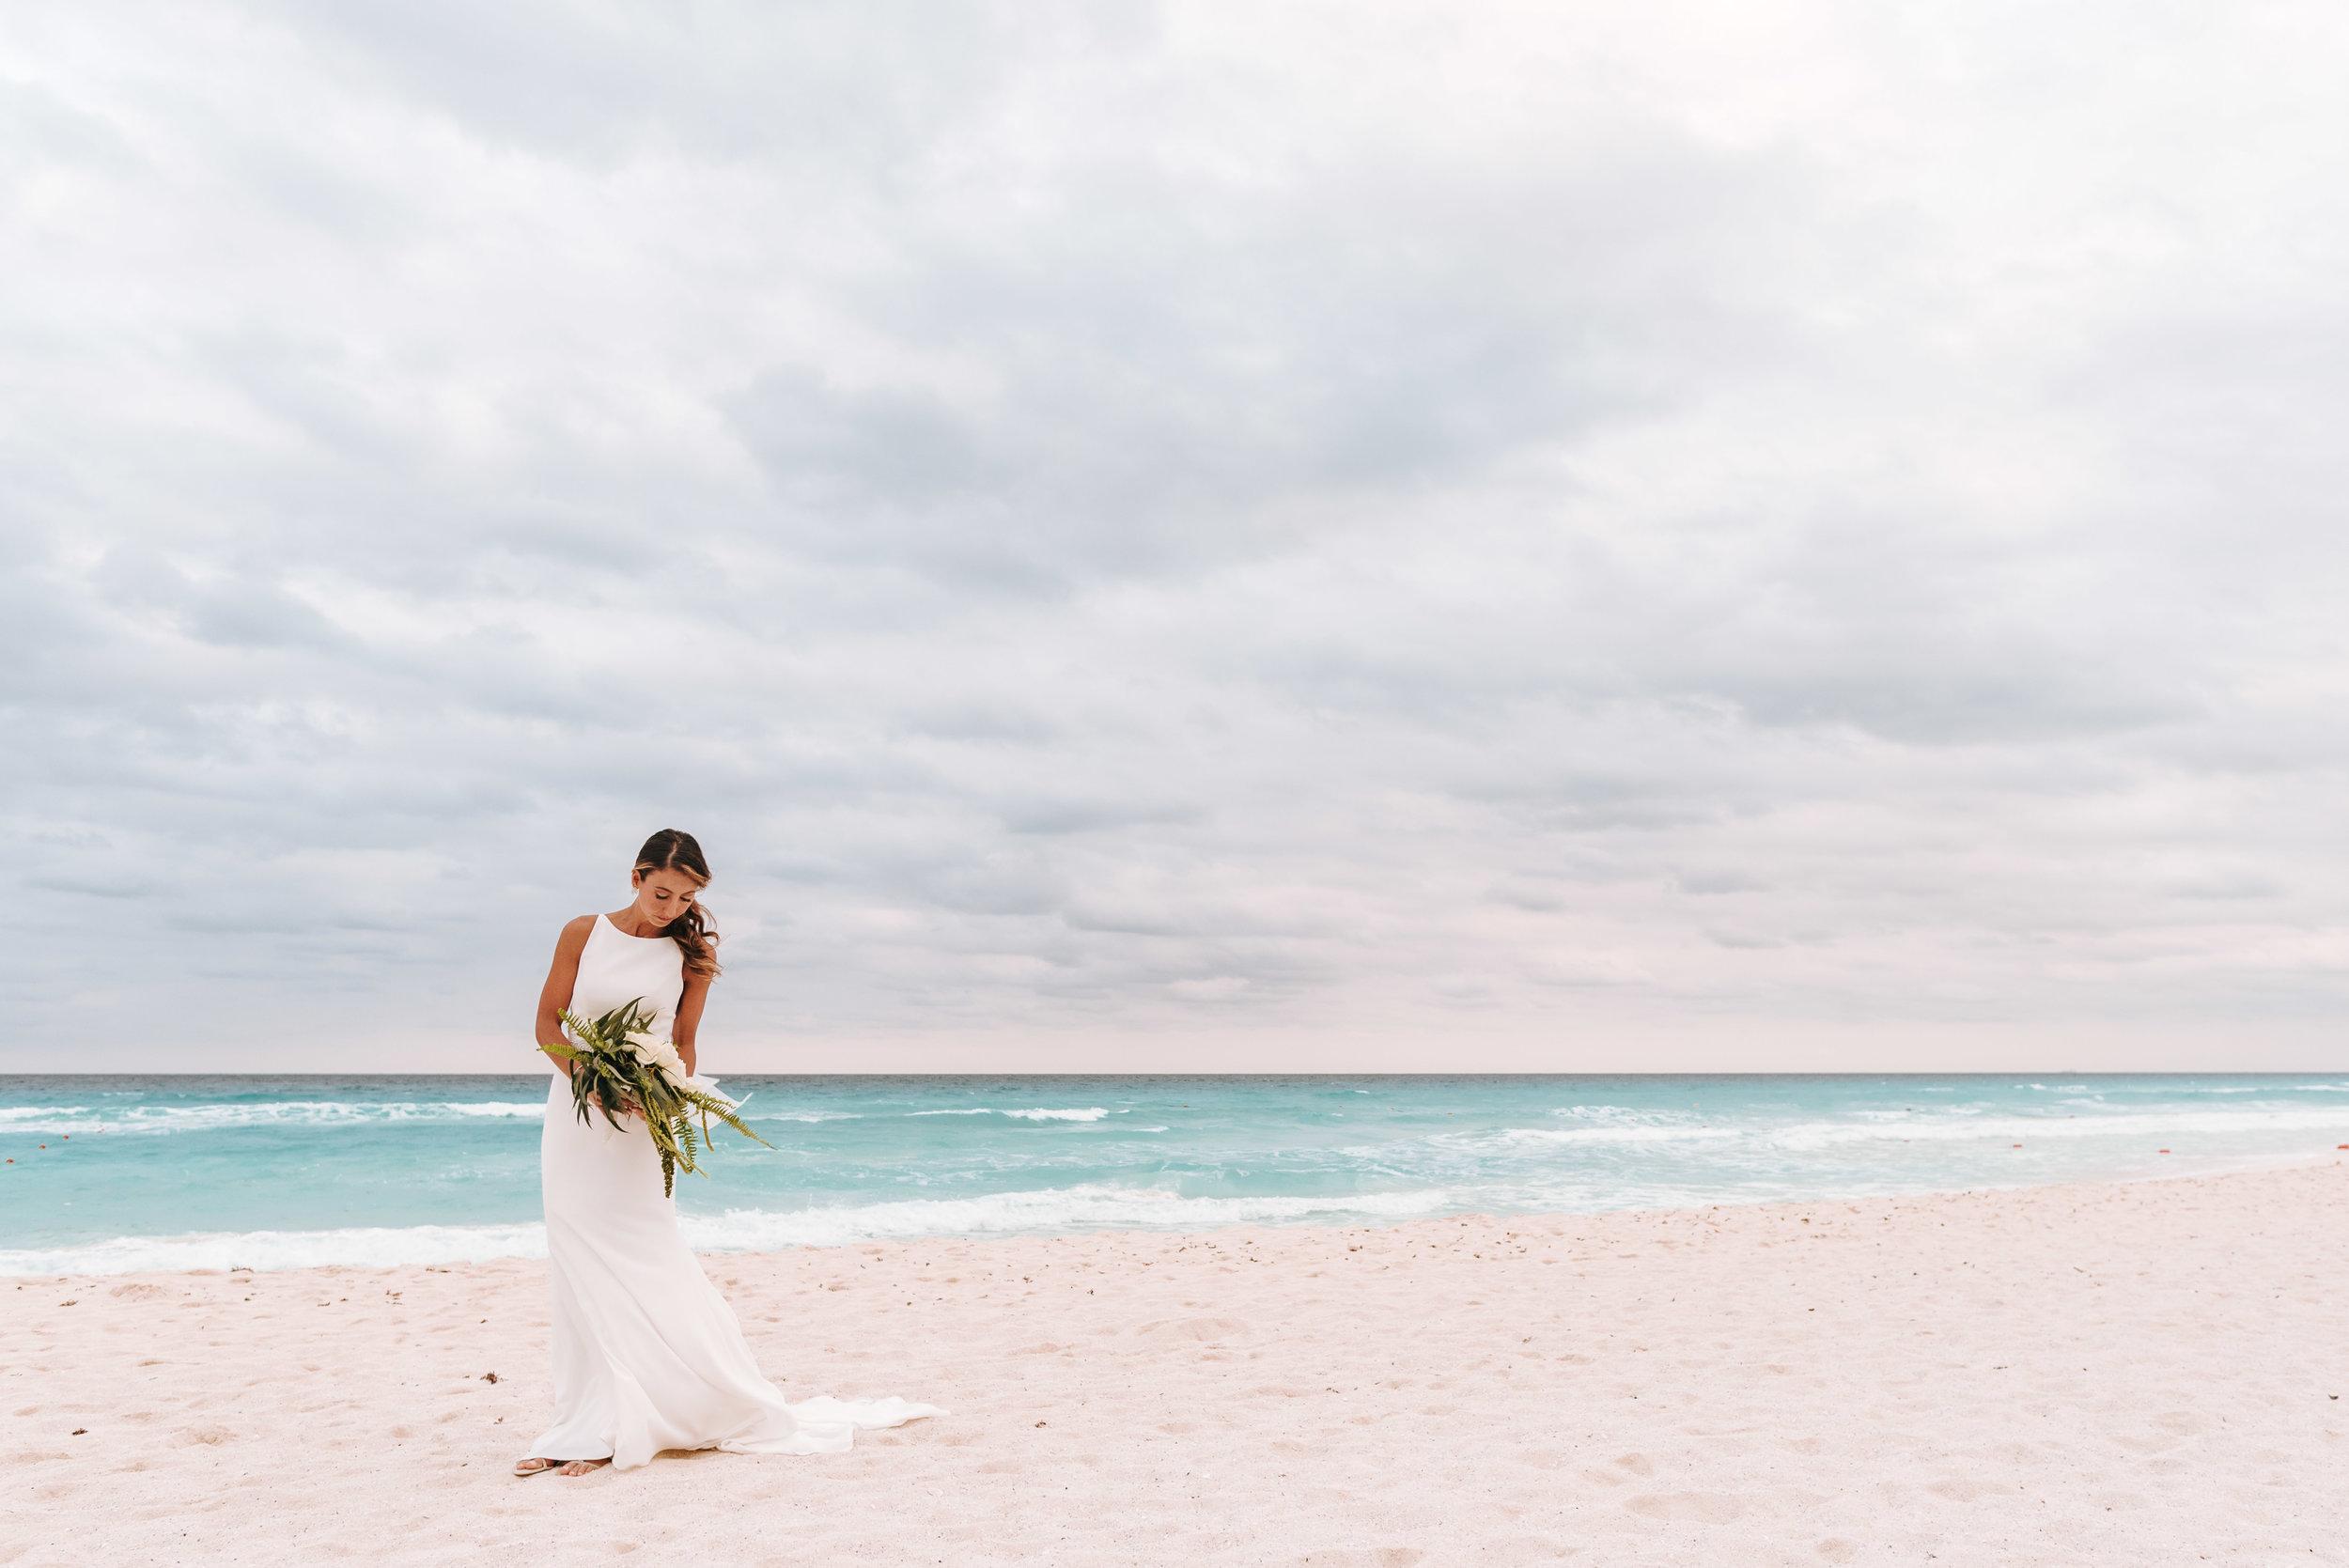 mexico_destination_wedding_ceremony-10.jpg